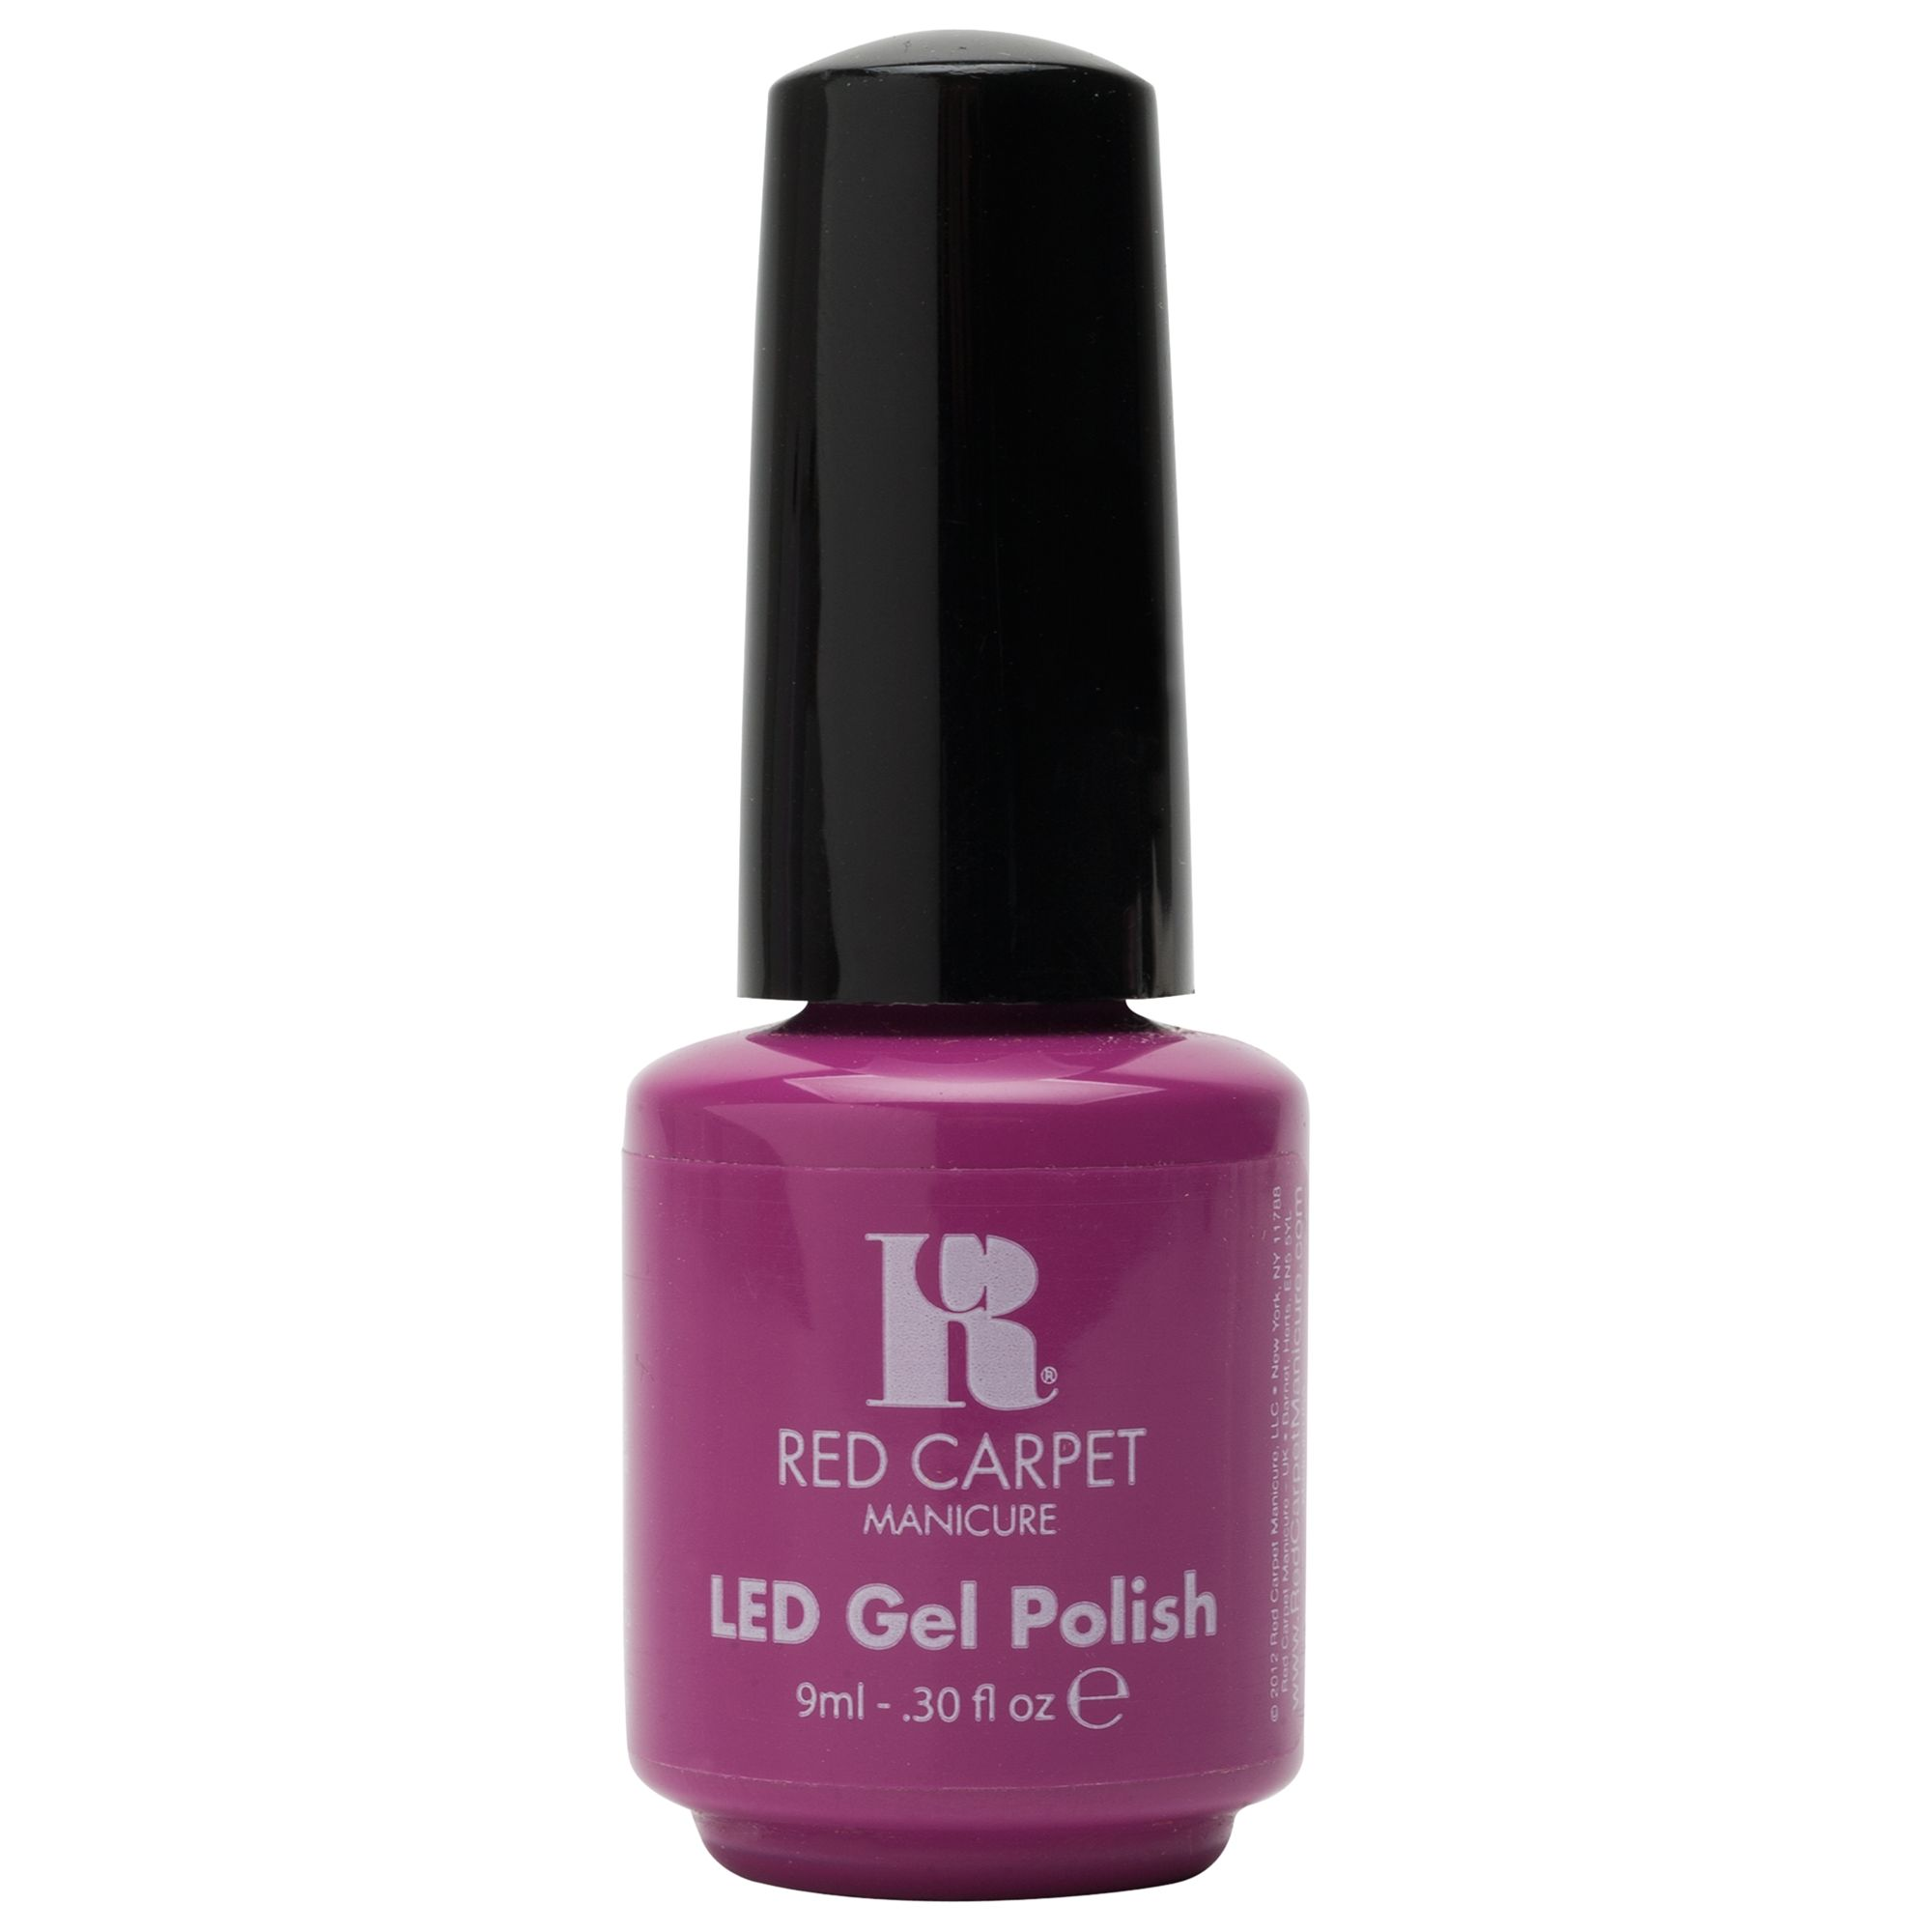 Red Carpet Manicure Red Carpet Manicure LED Gel Nail Polish - Purples & Blues, 9ml